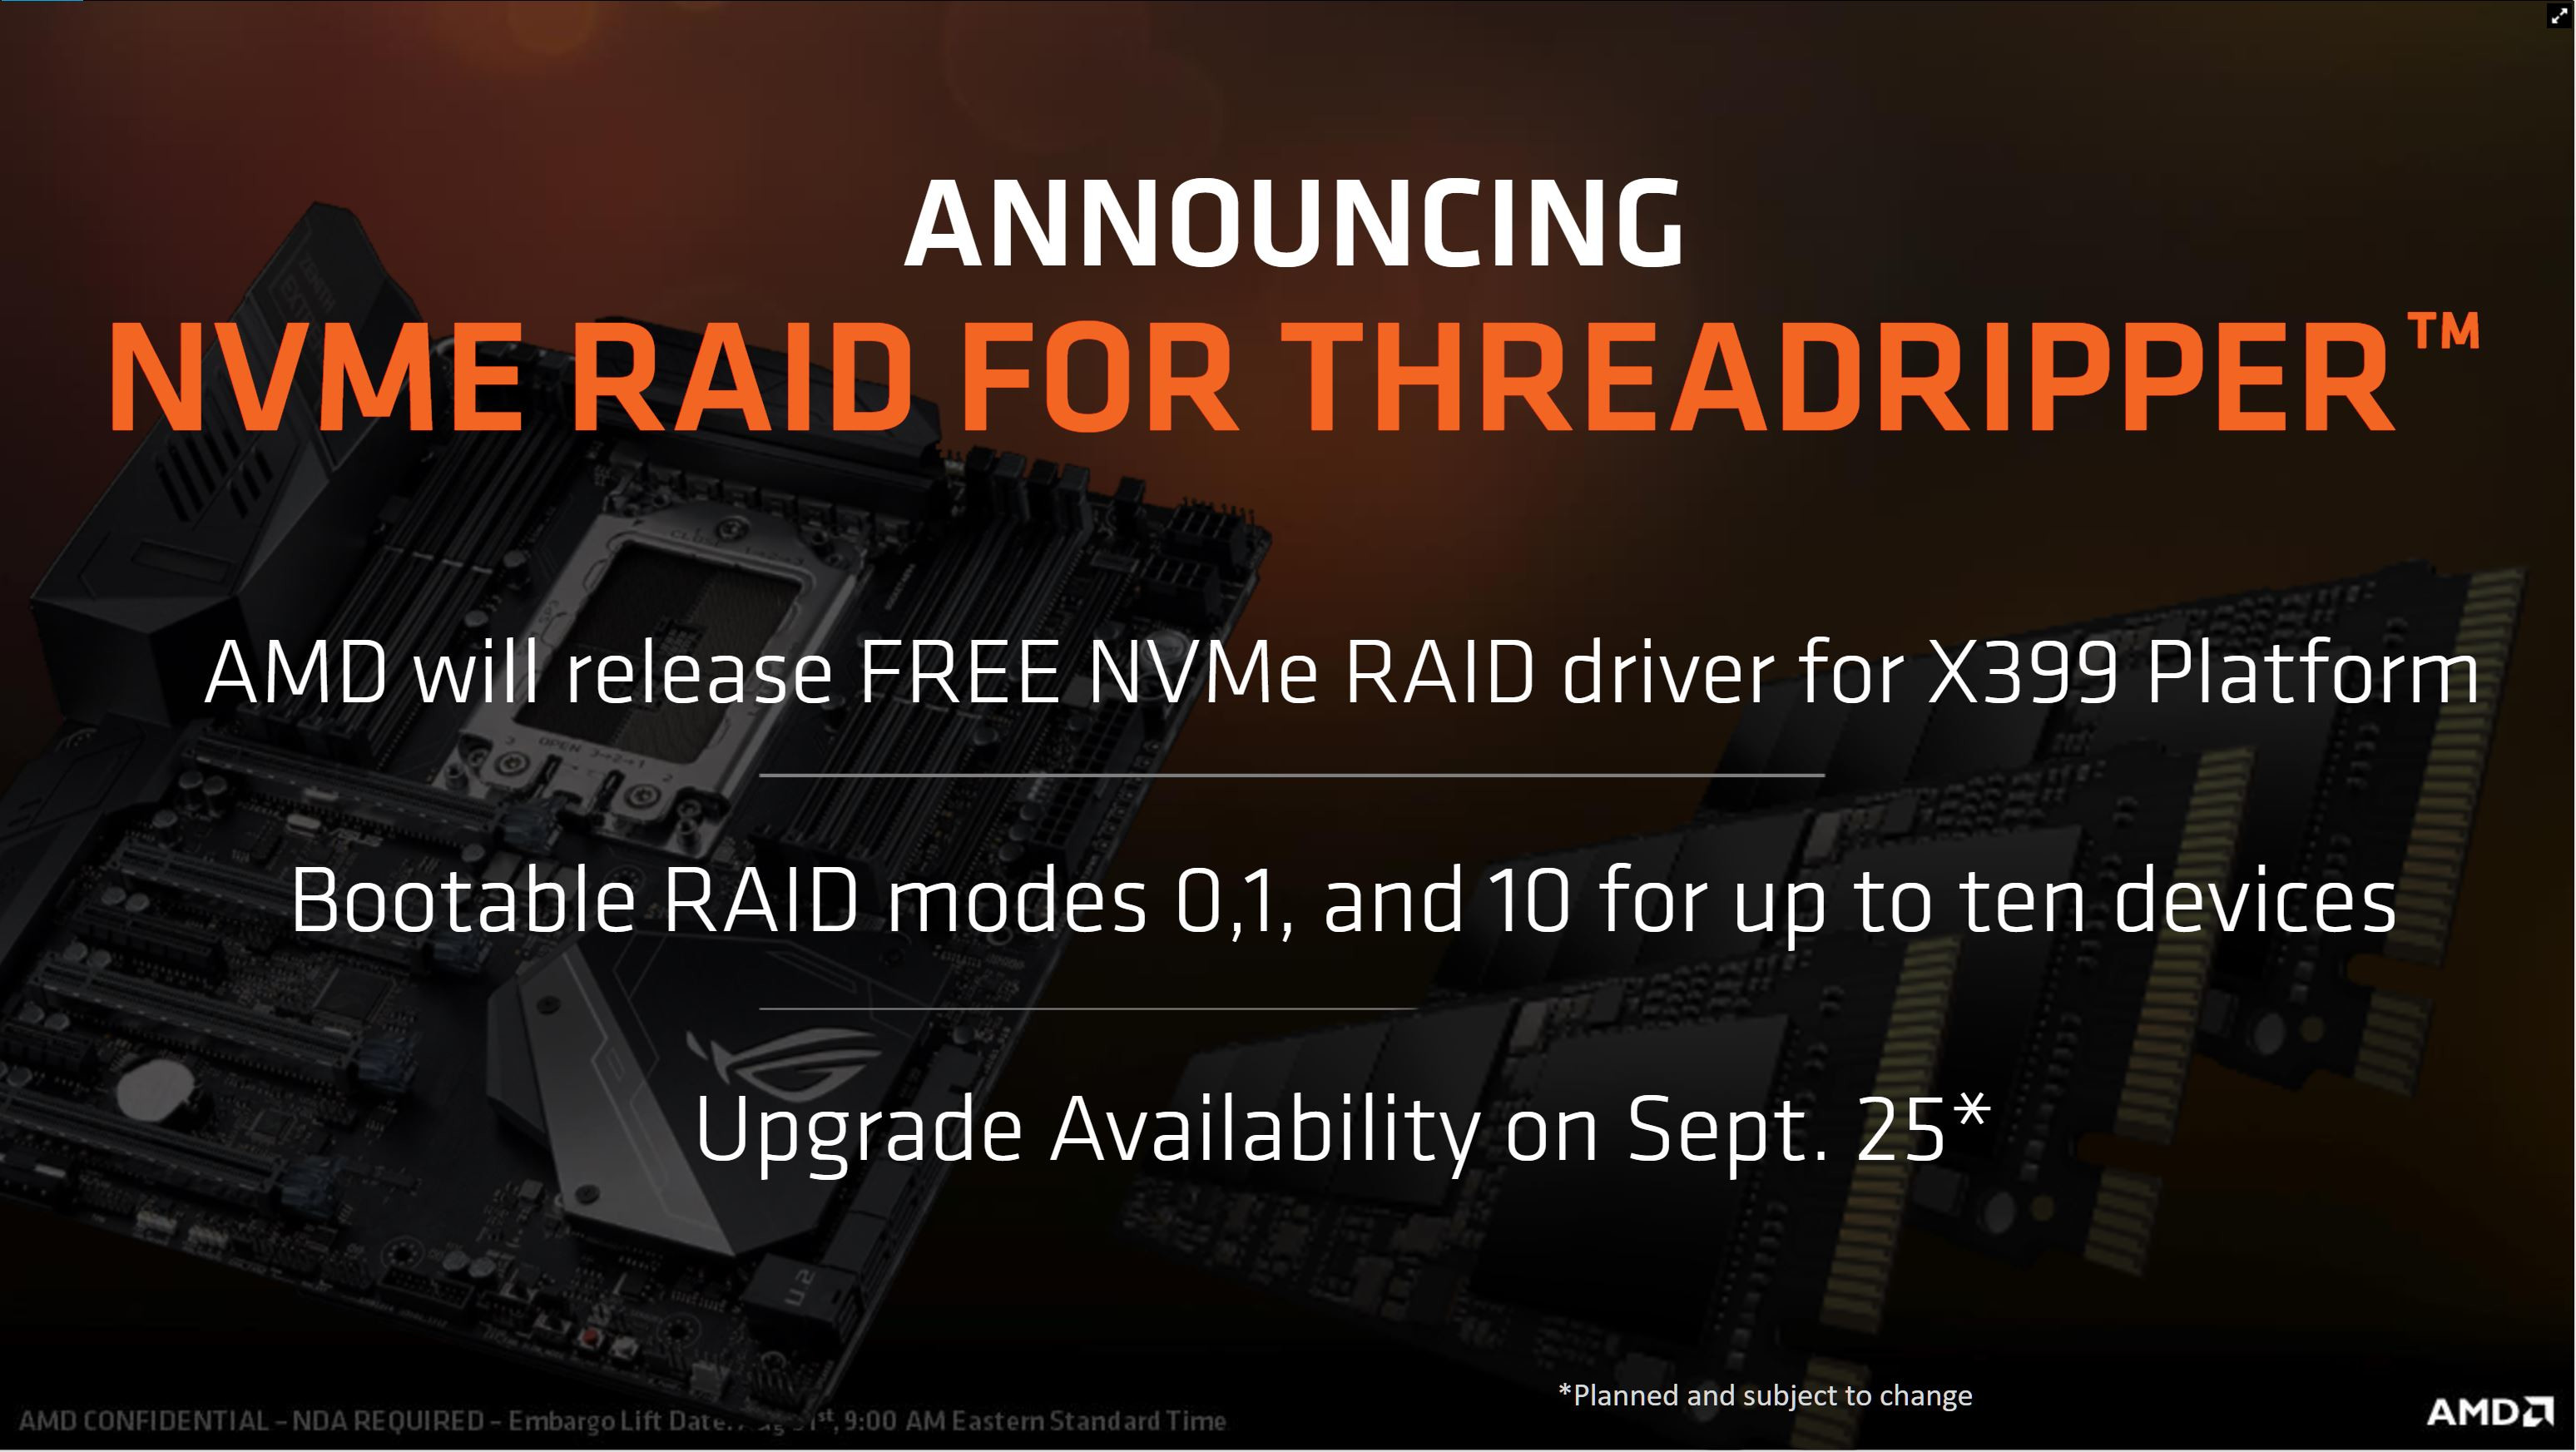 Threadripper&TRX40環境でNVMe RAIDにOSをインストールする方法 : 自作とゲームと趣味の日々